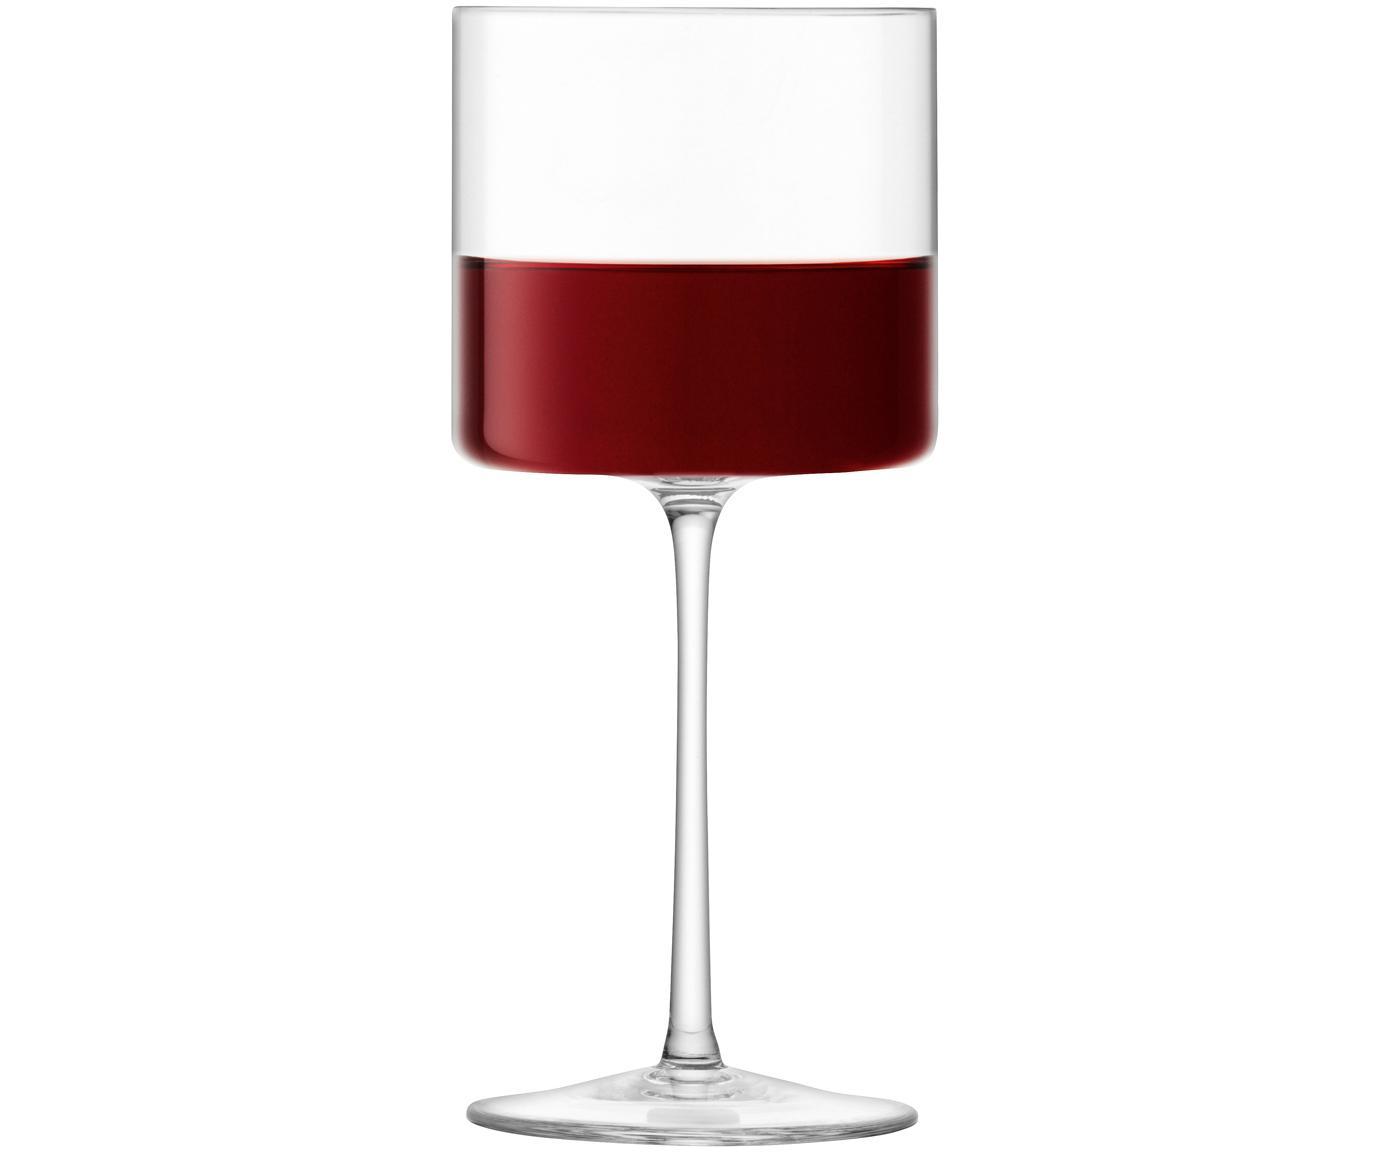 Wijnglazenset Otis in vierkante vorm, 4-delig, Glas, Transparant, Ø 8 x H 19 cm